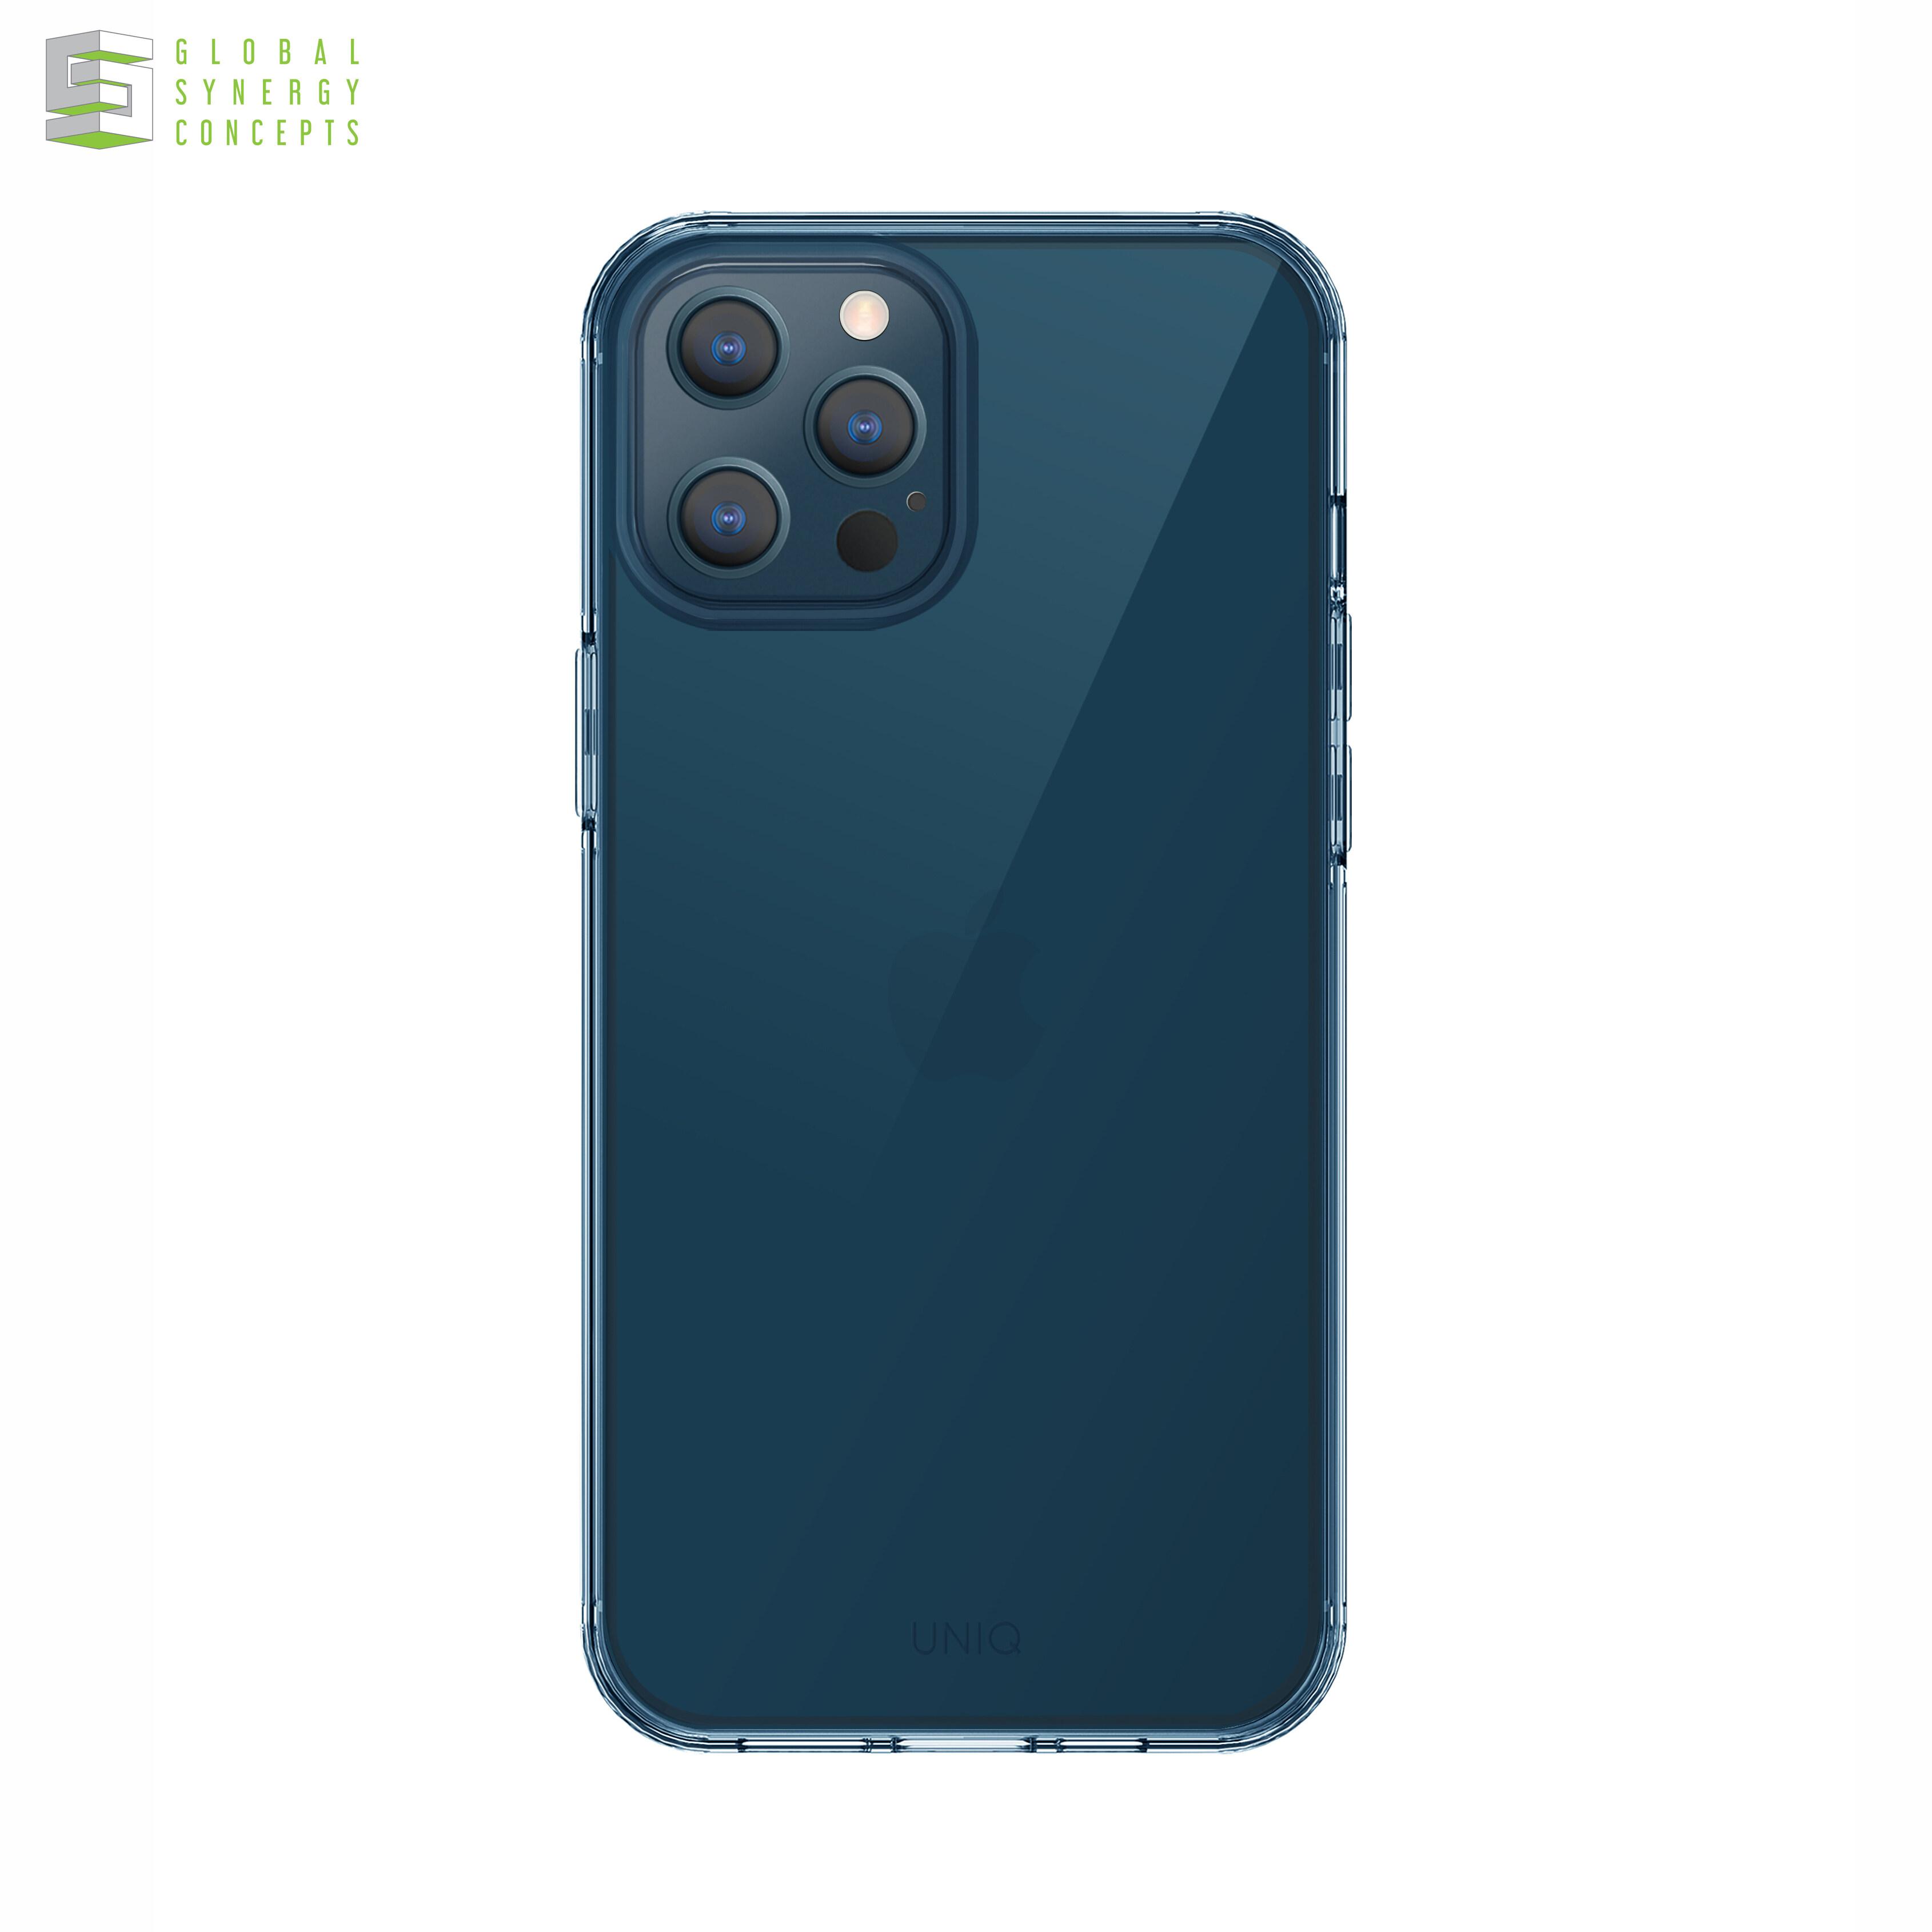 Uniq CASE Apple iPhone 12 Pro (2020) series Hybrid Air Fender Antimicrobial